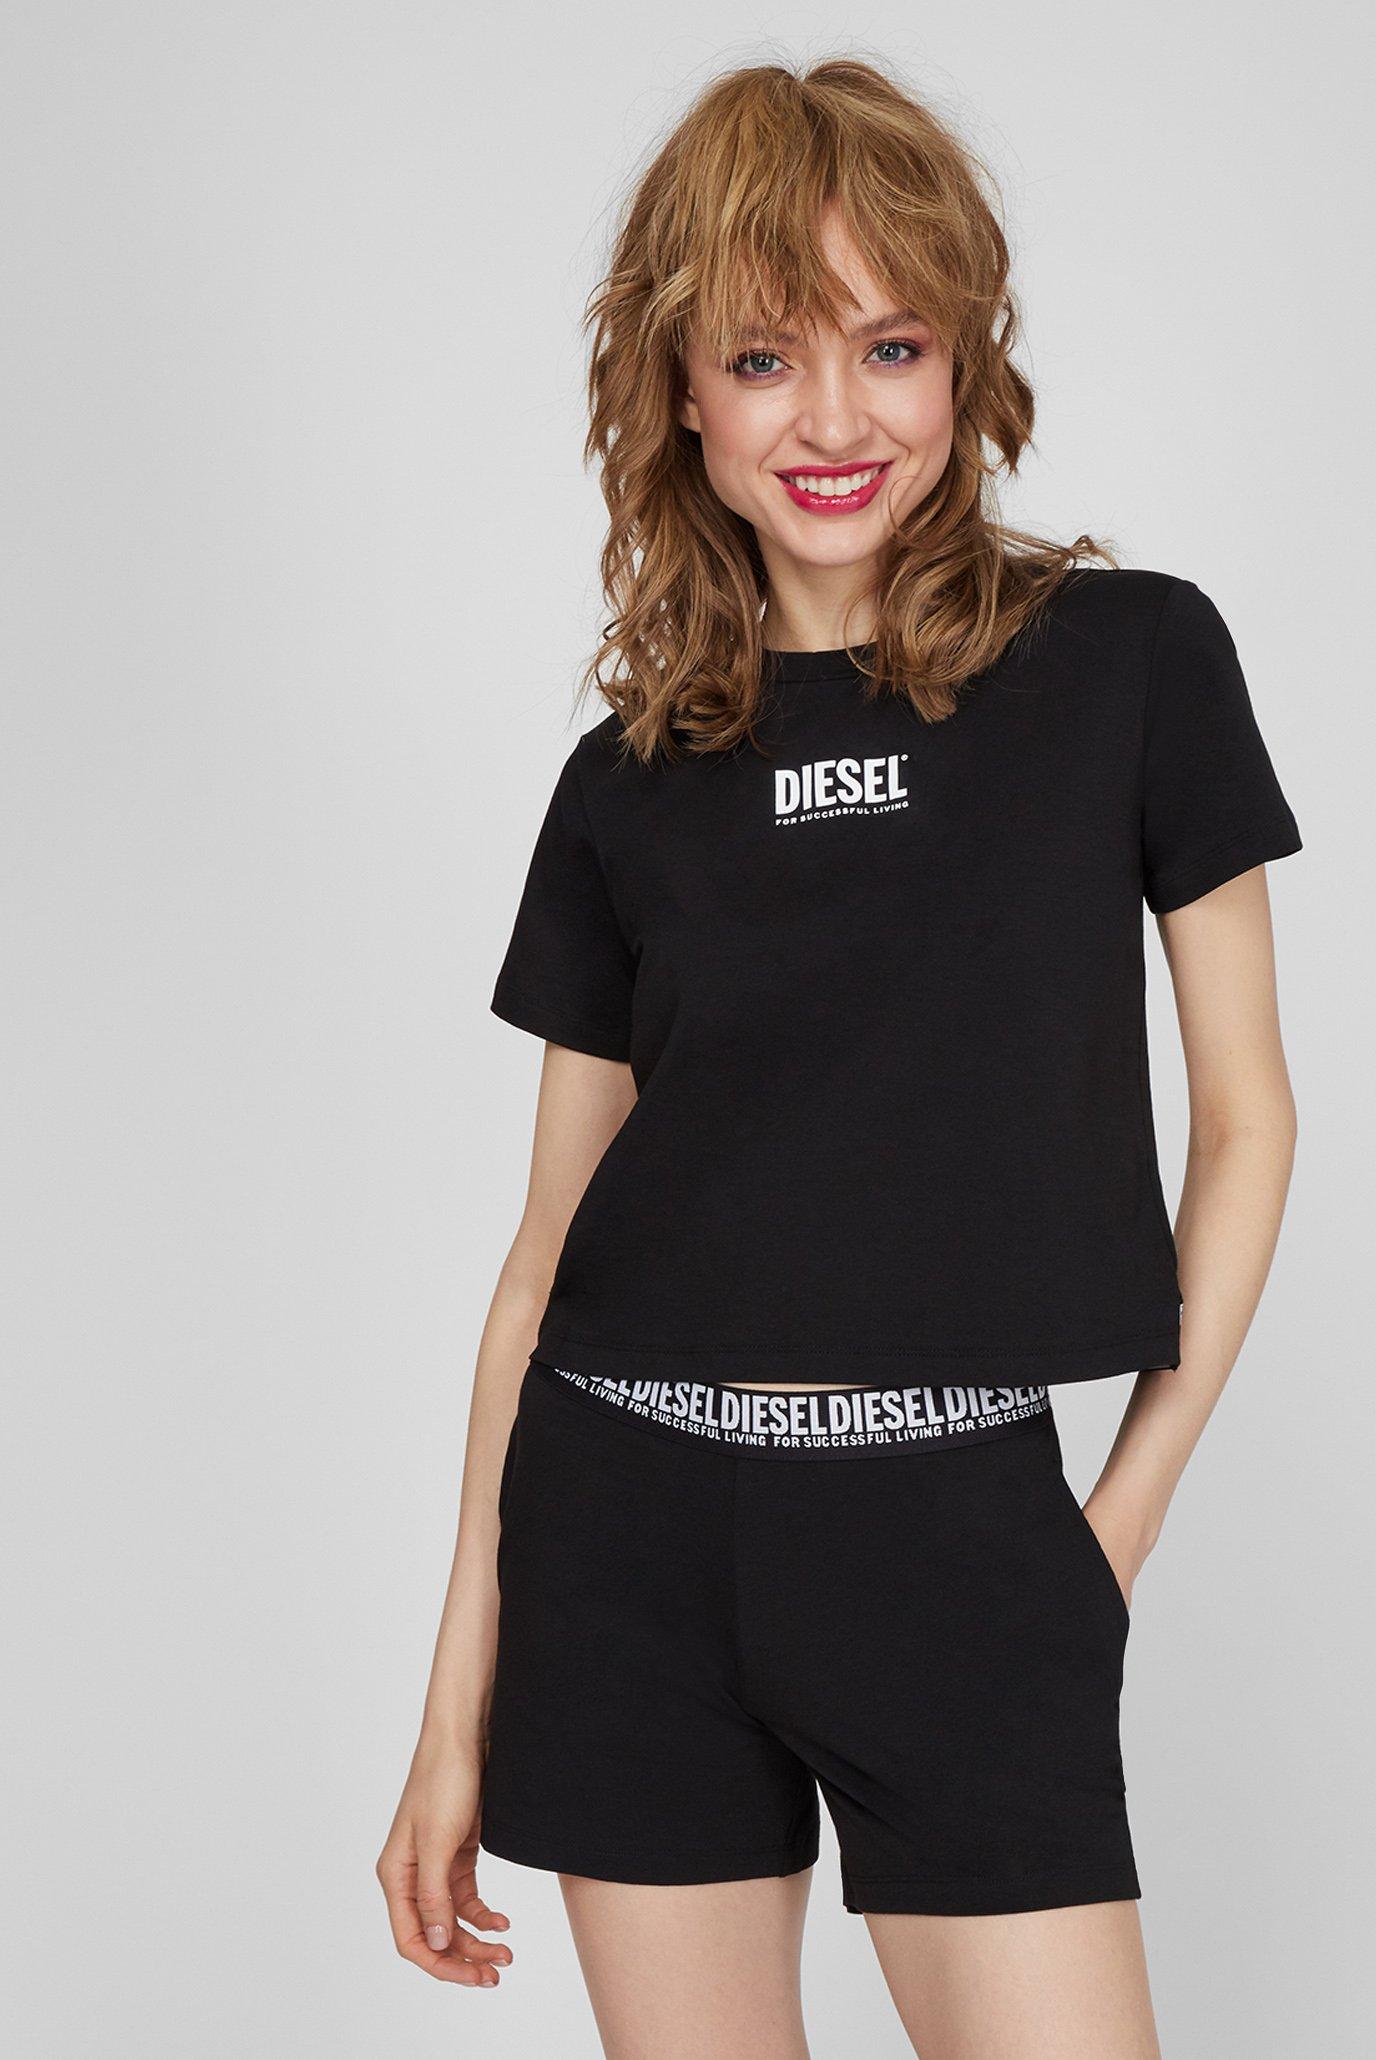 Женская черная пижама (футболка, шорты) UFSET-PIJIMMY 1